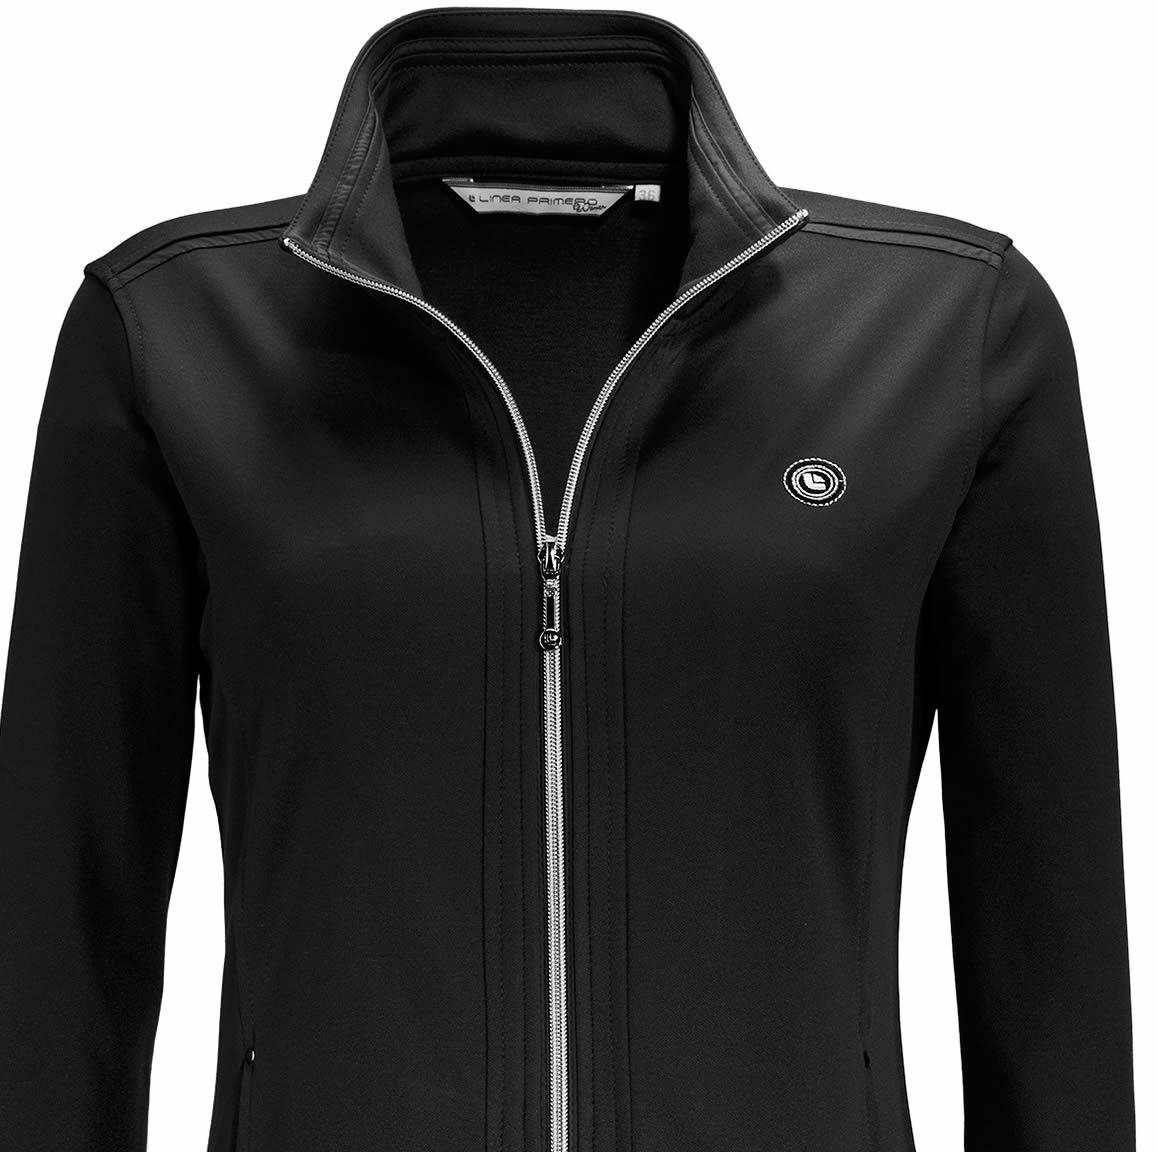 Linea Primero Sport Freizeit Jacke Damen in Plus Size